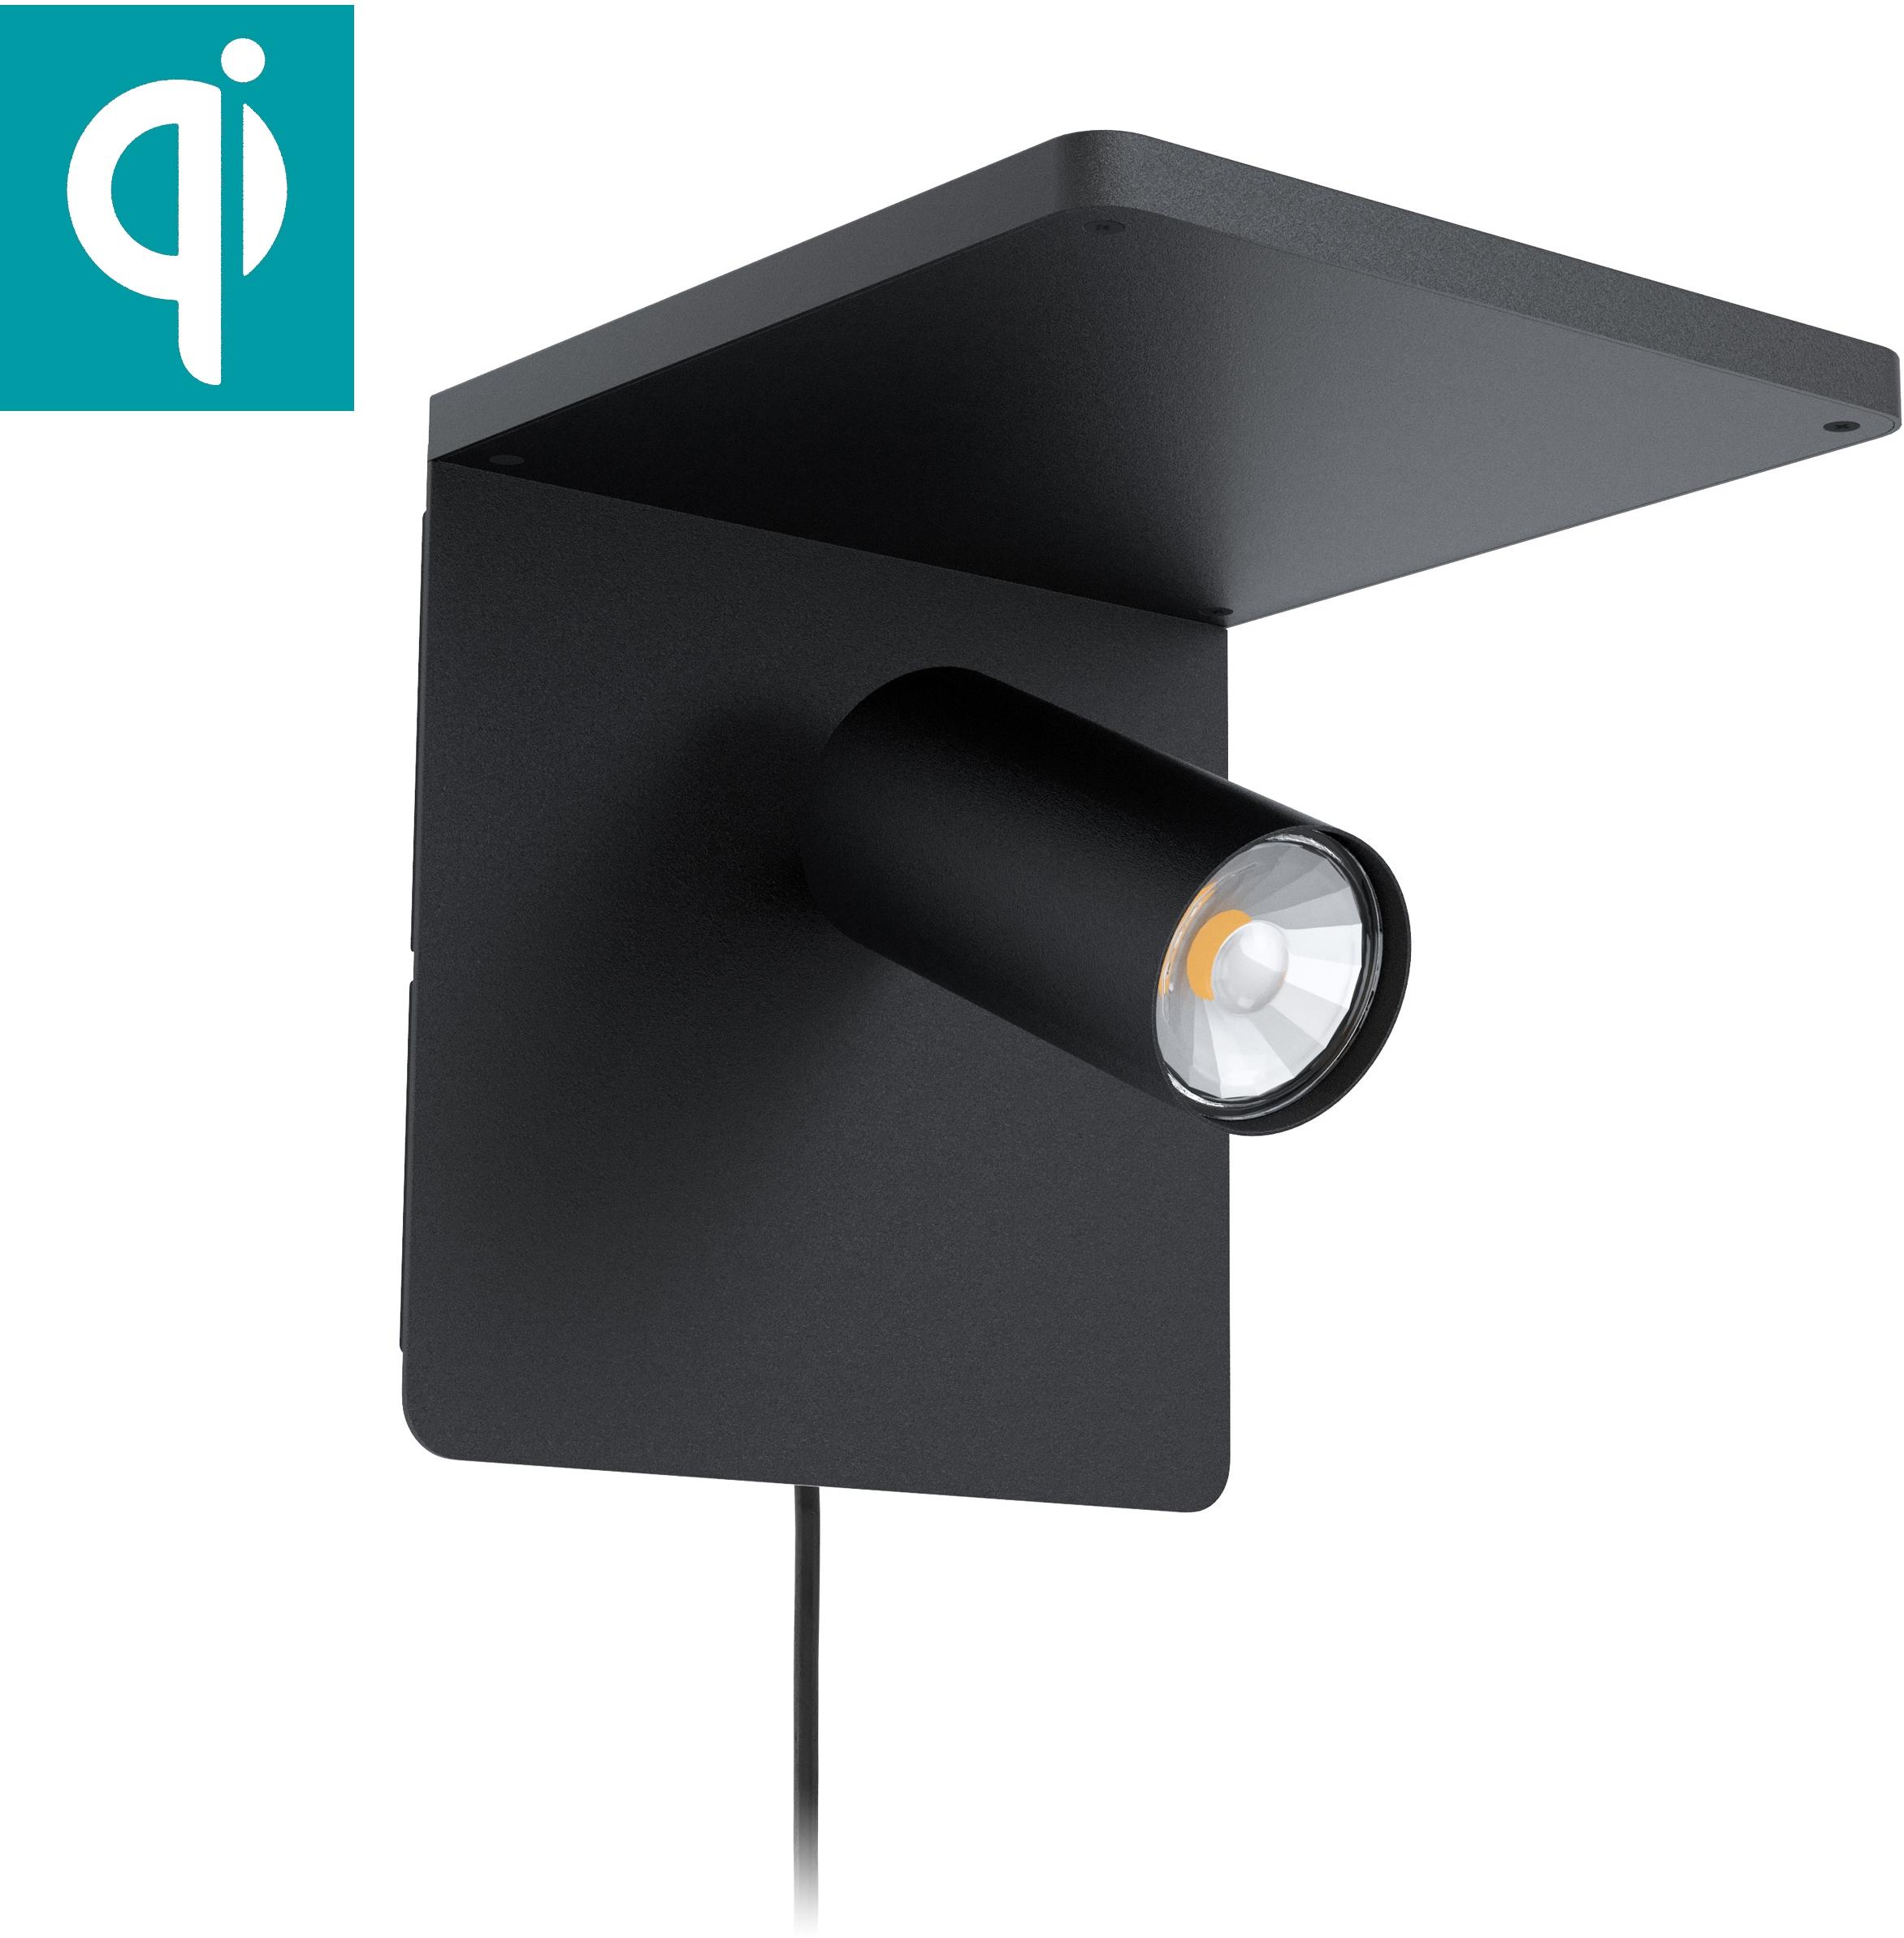 EGLO Wandleuchte CIGLIE, GU10, Warmweiß, QI-charger